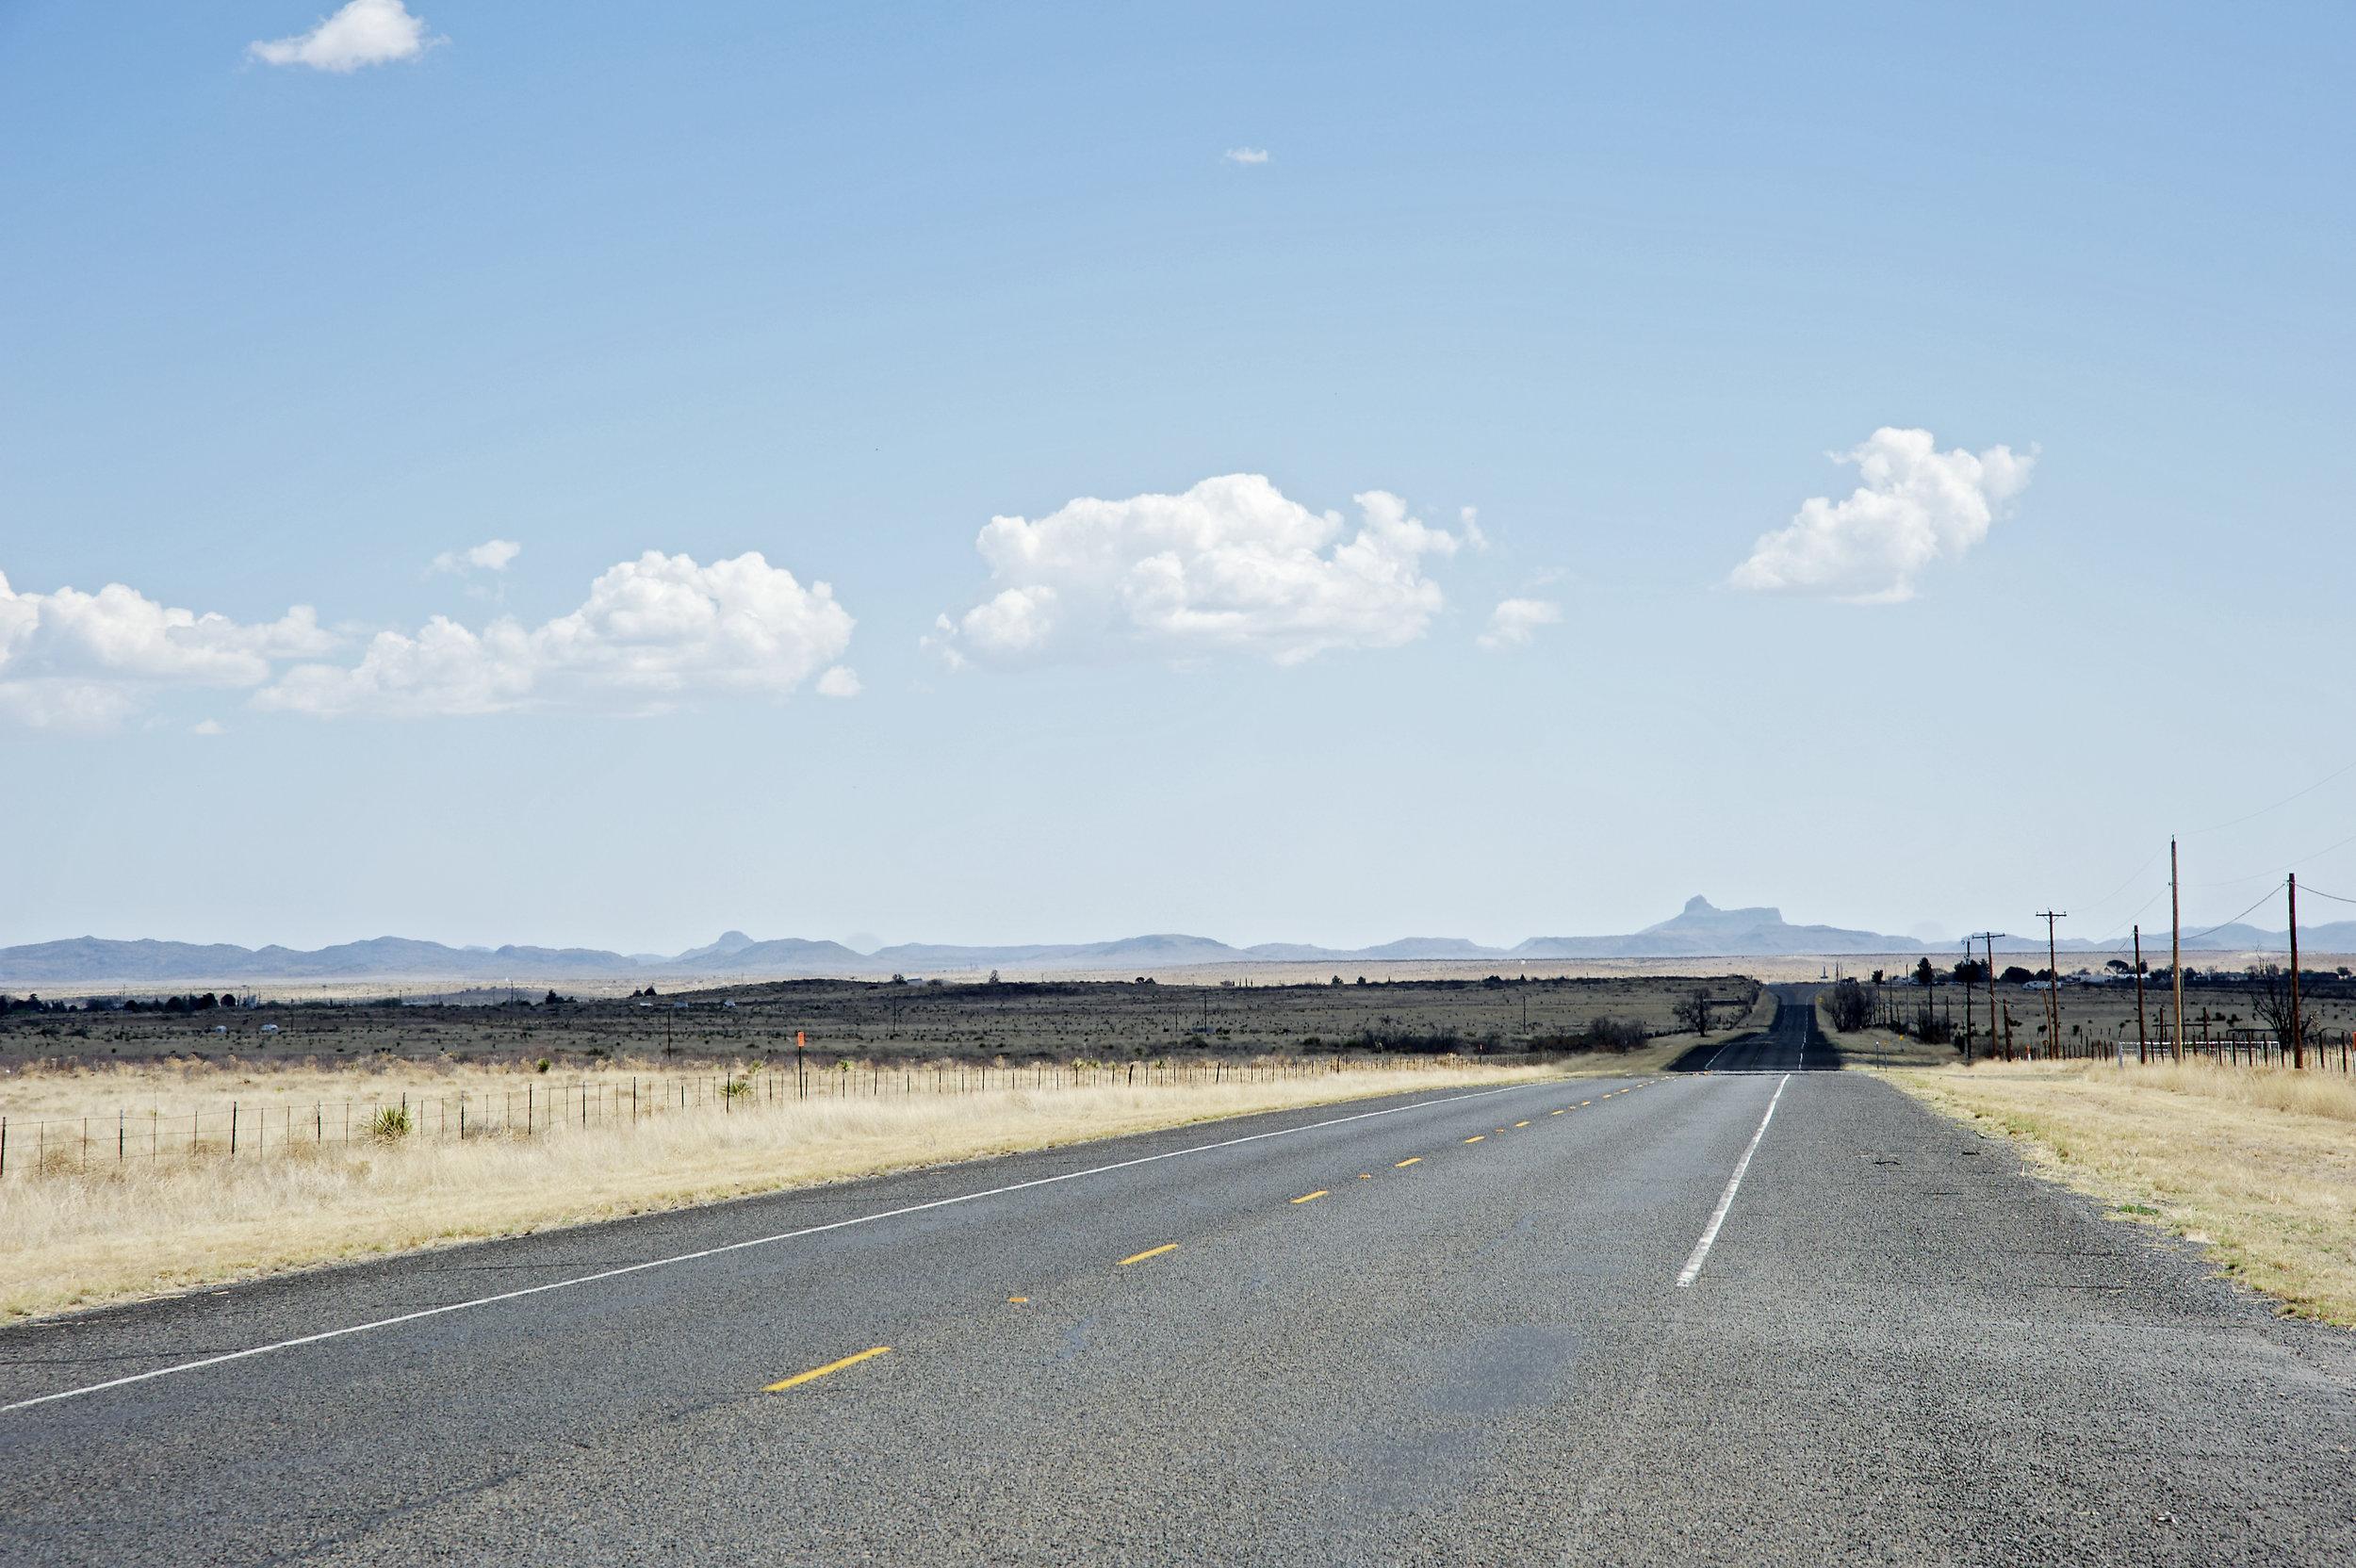 Highway_DSC5747.jpg